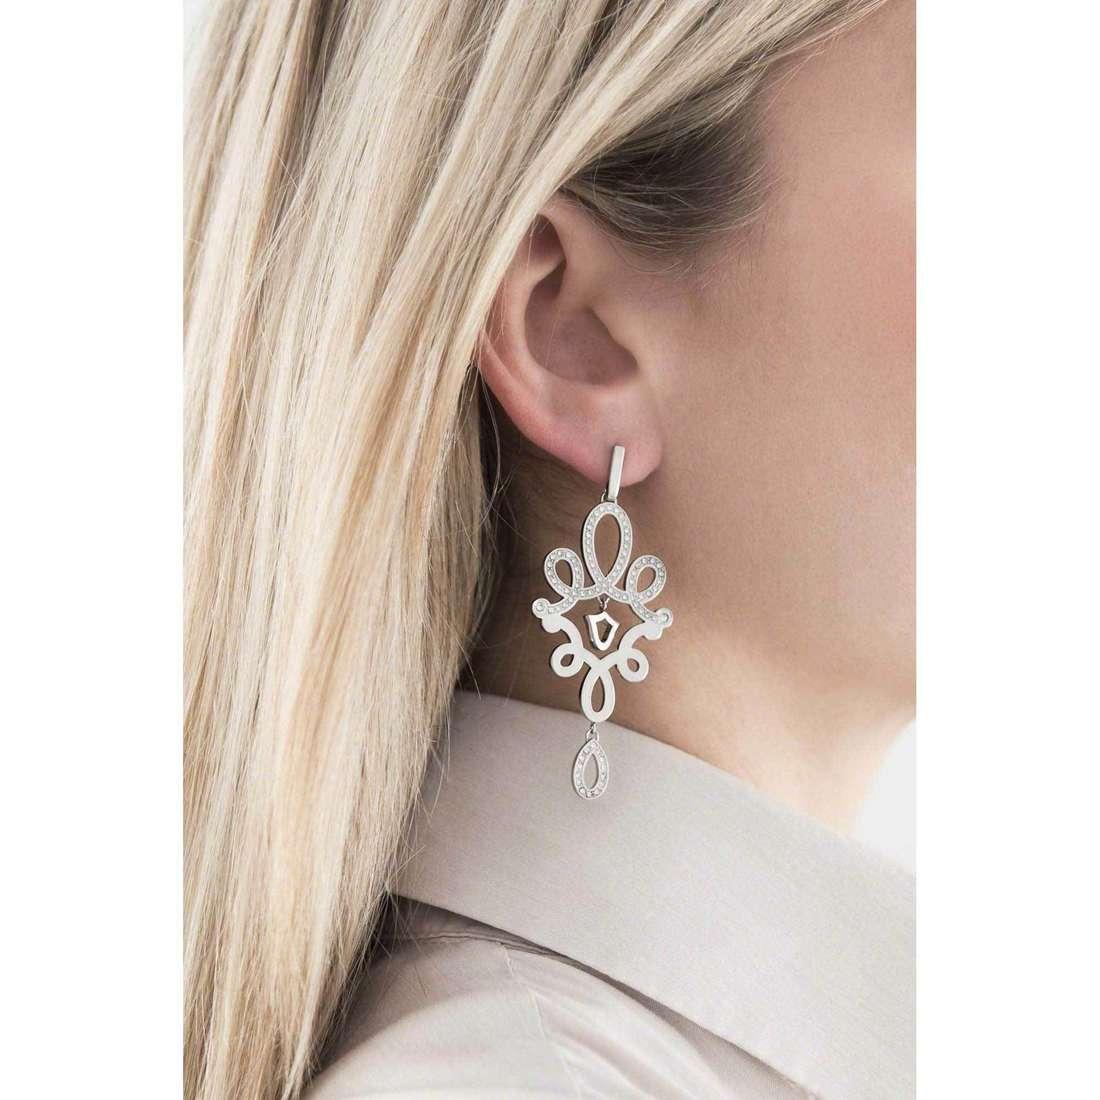 Morellato boucles d'oreille Arabesco femme SAAJ19 indosso